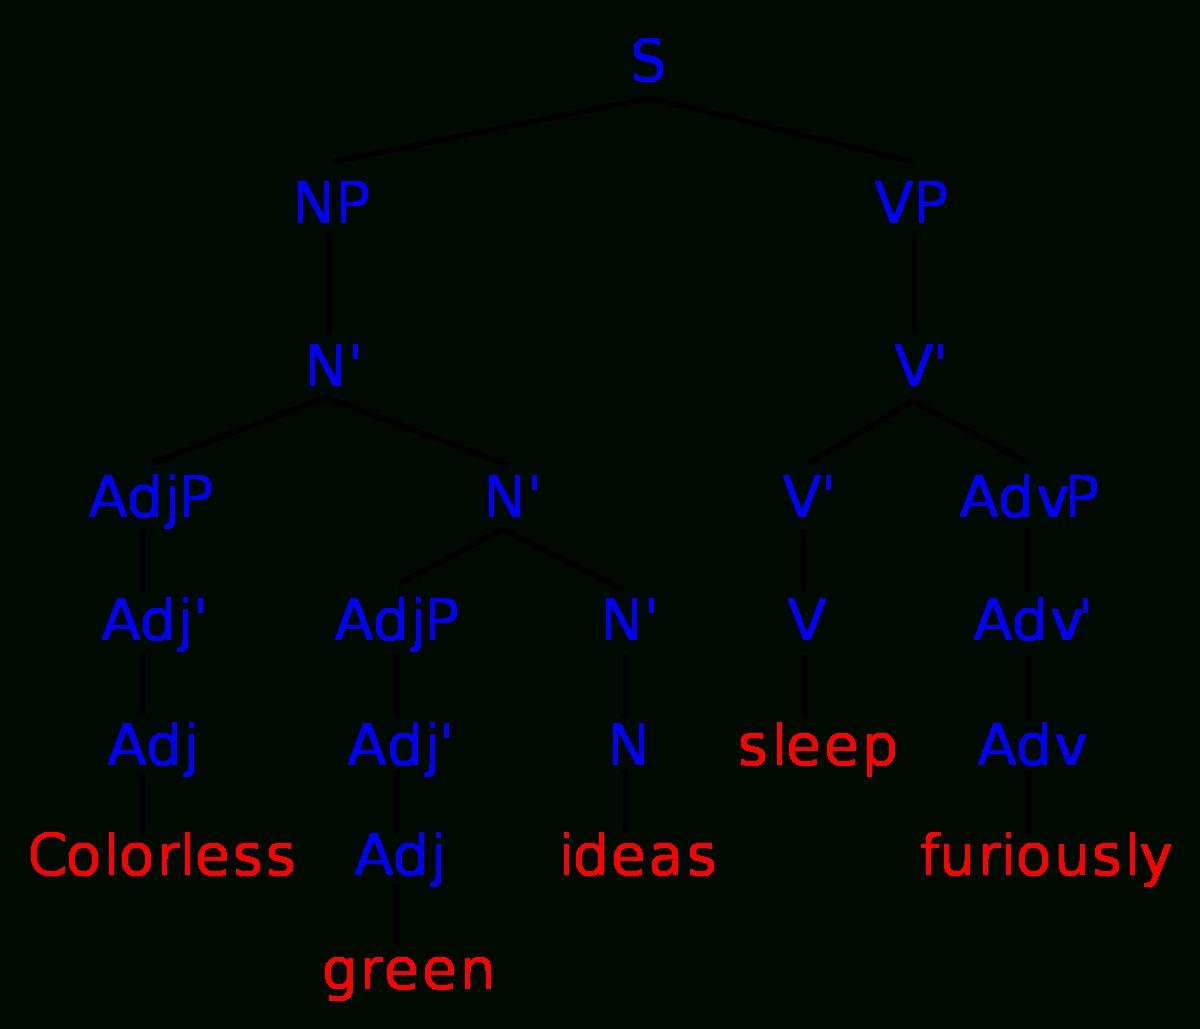 10 Gorgeous Colorless Green Ideas Sleep Furiously colorless green ideas sleep furiously wikipedia 2020